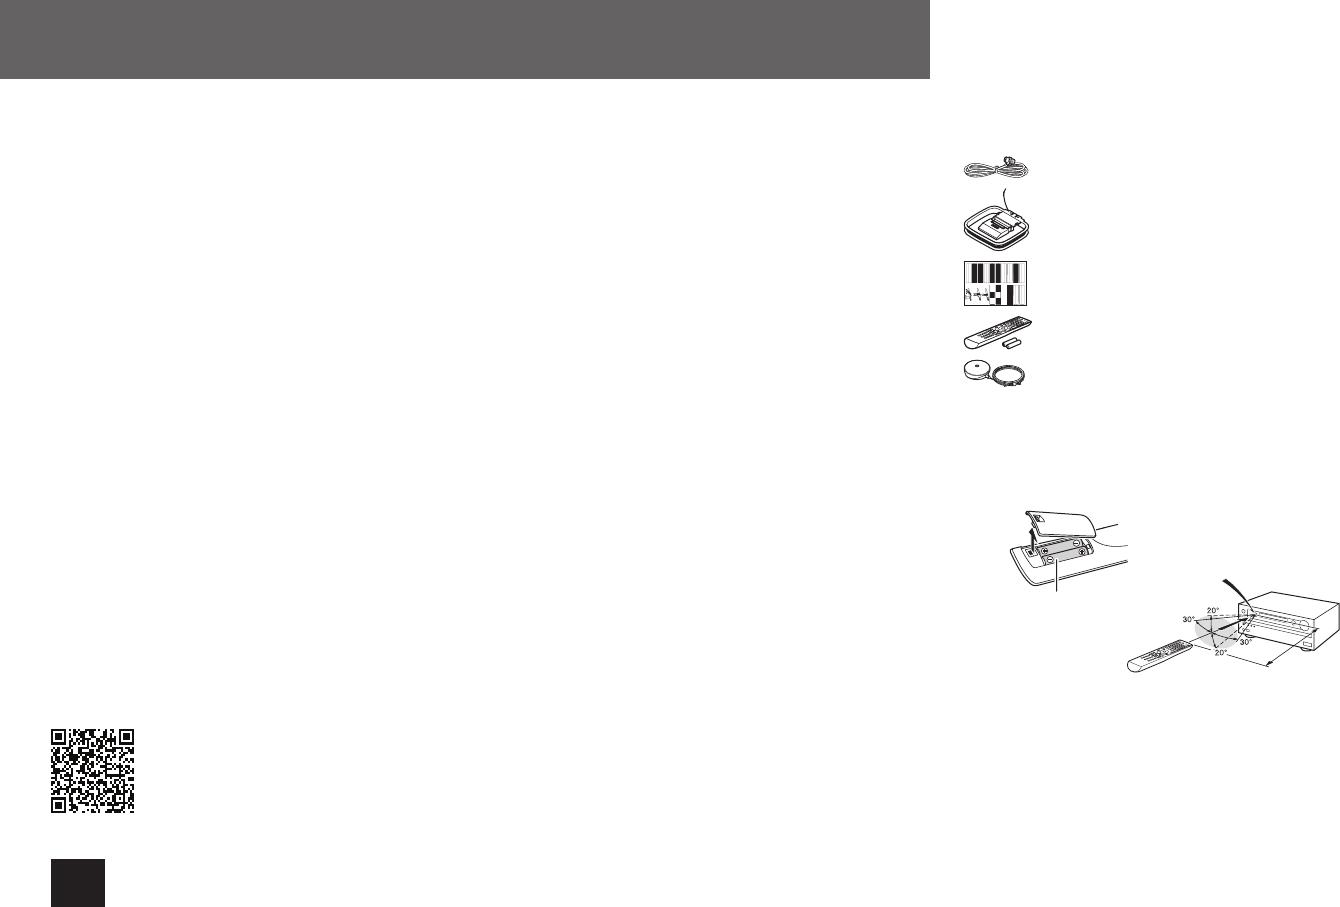 Handleiding Onkyo TX-NR636 (pagina 1 van 100) (Deutsch